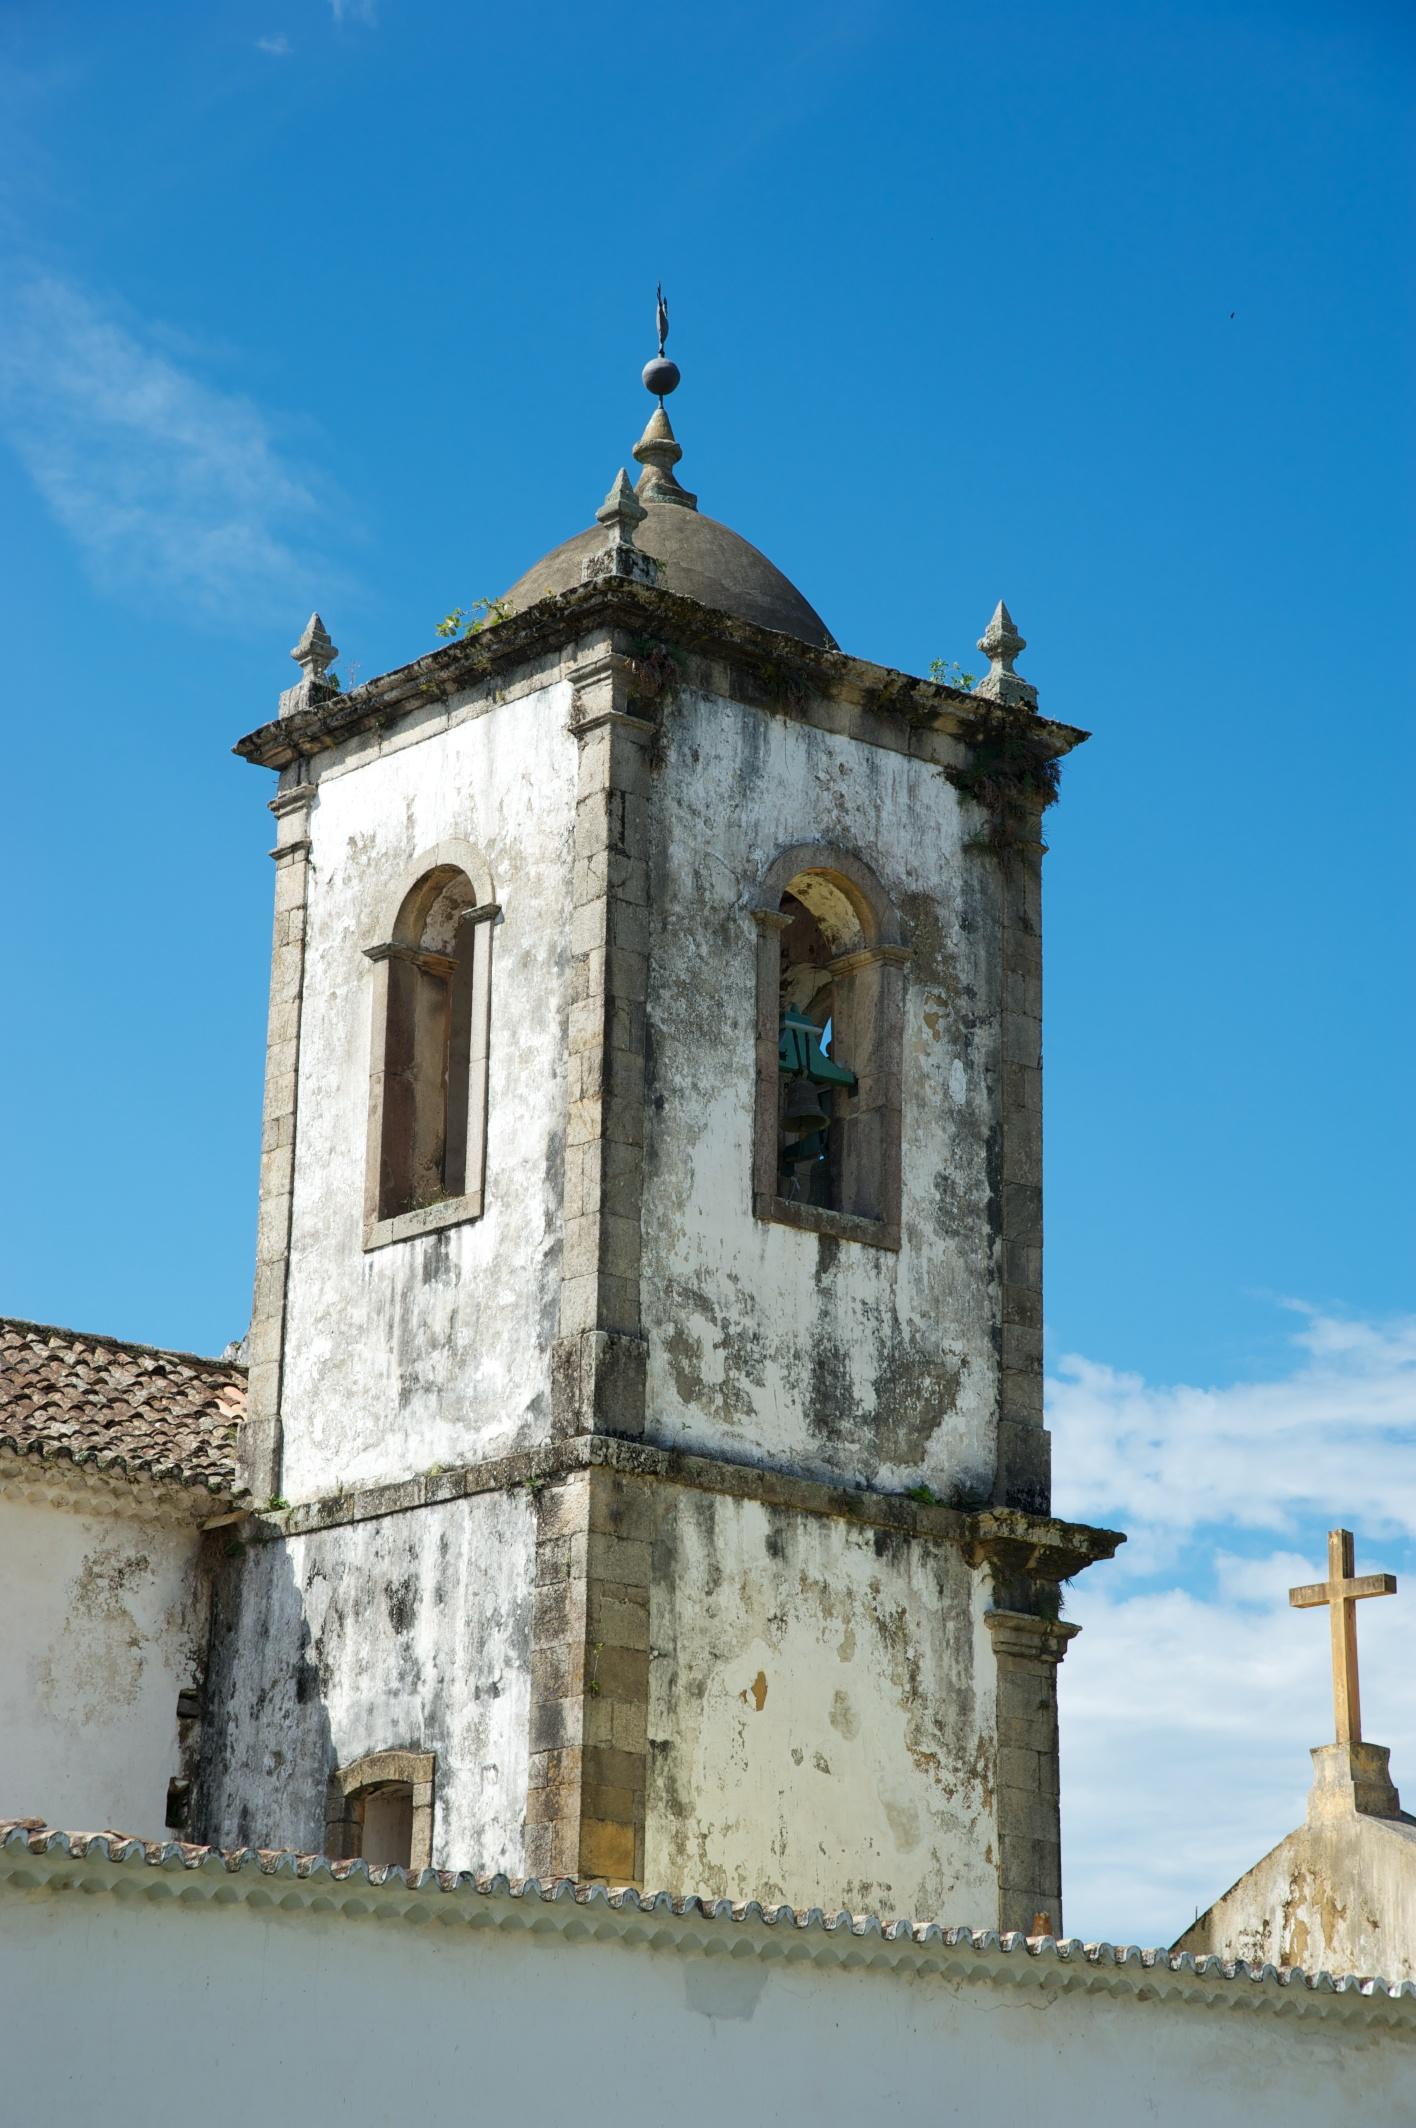 Church spire, Paraty, Costa Verde, Brazil, 12 Apr 2012